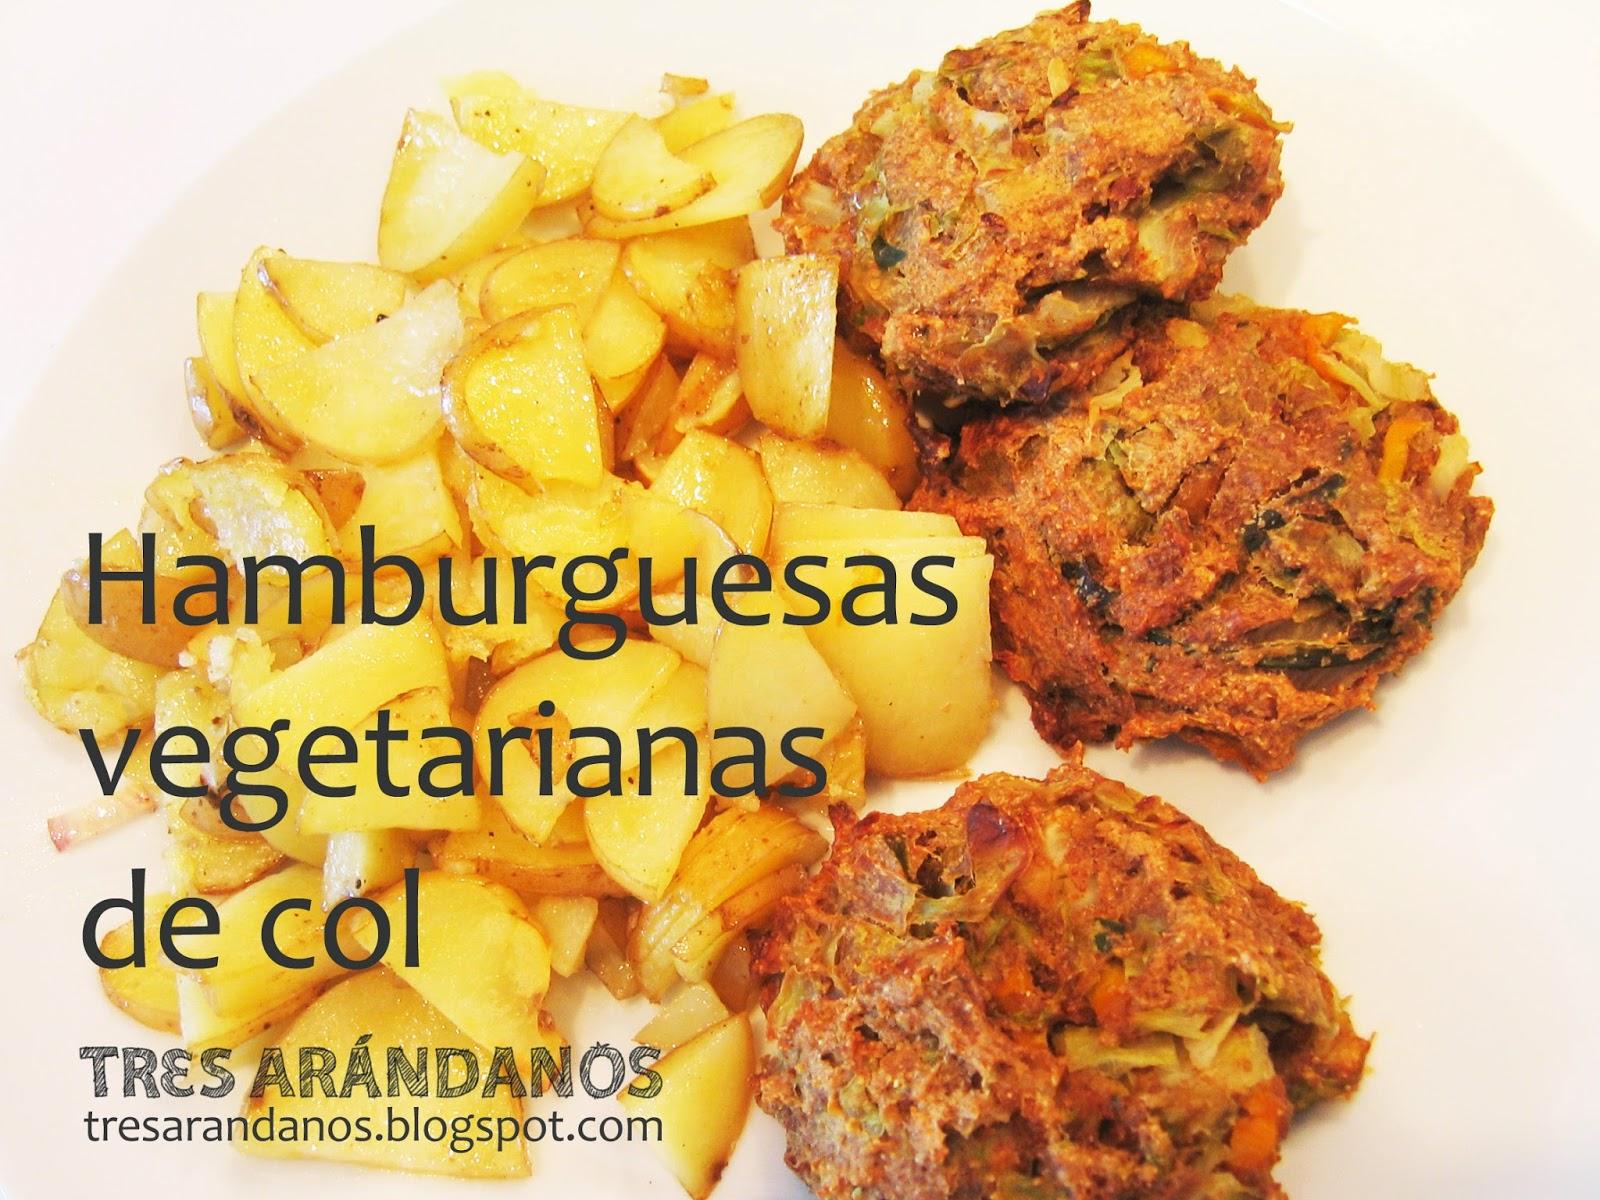 HAMBURGUESAS DE COL